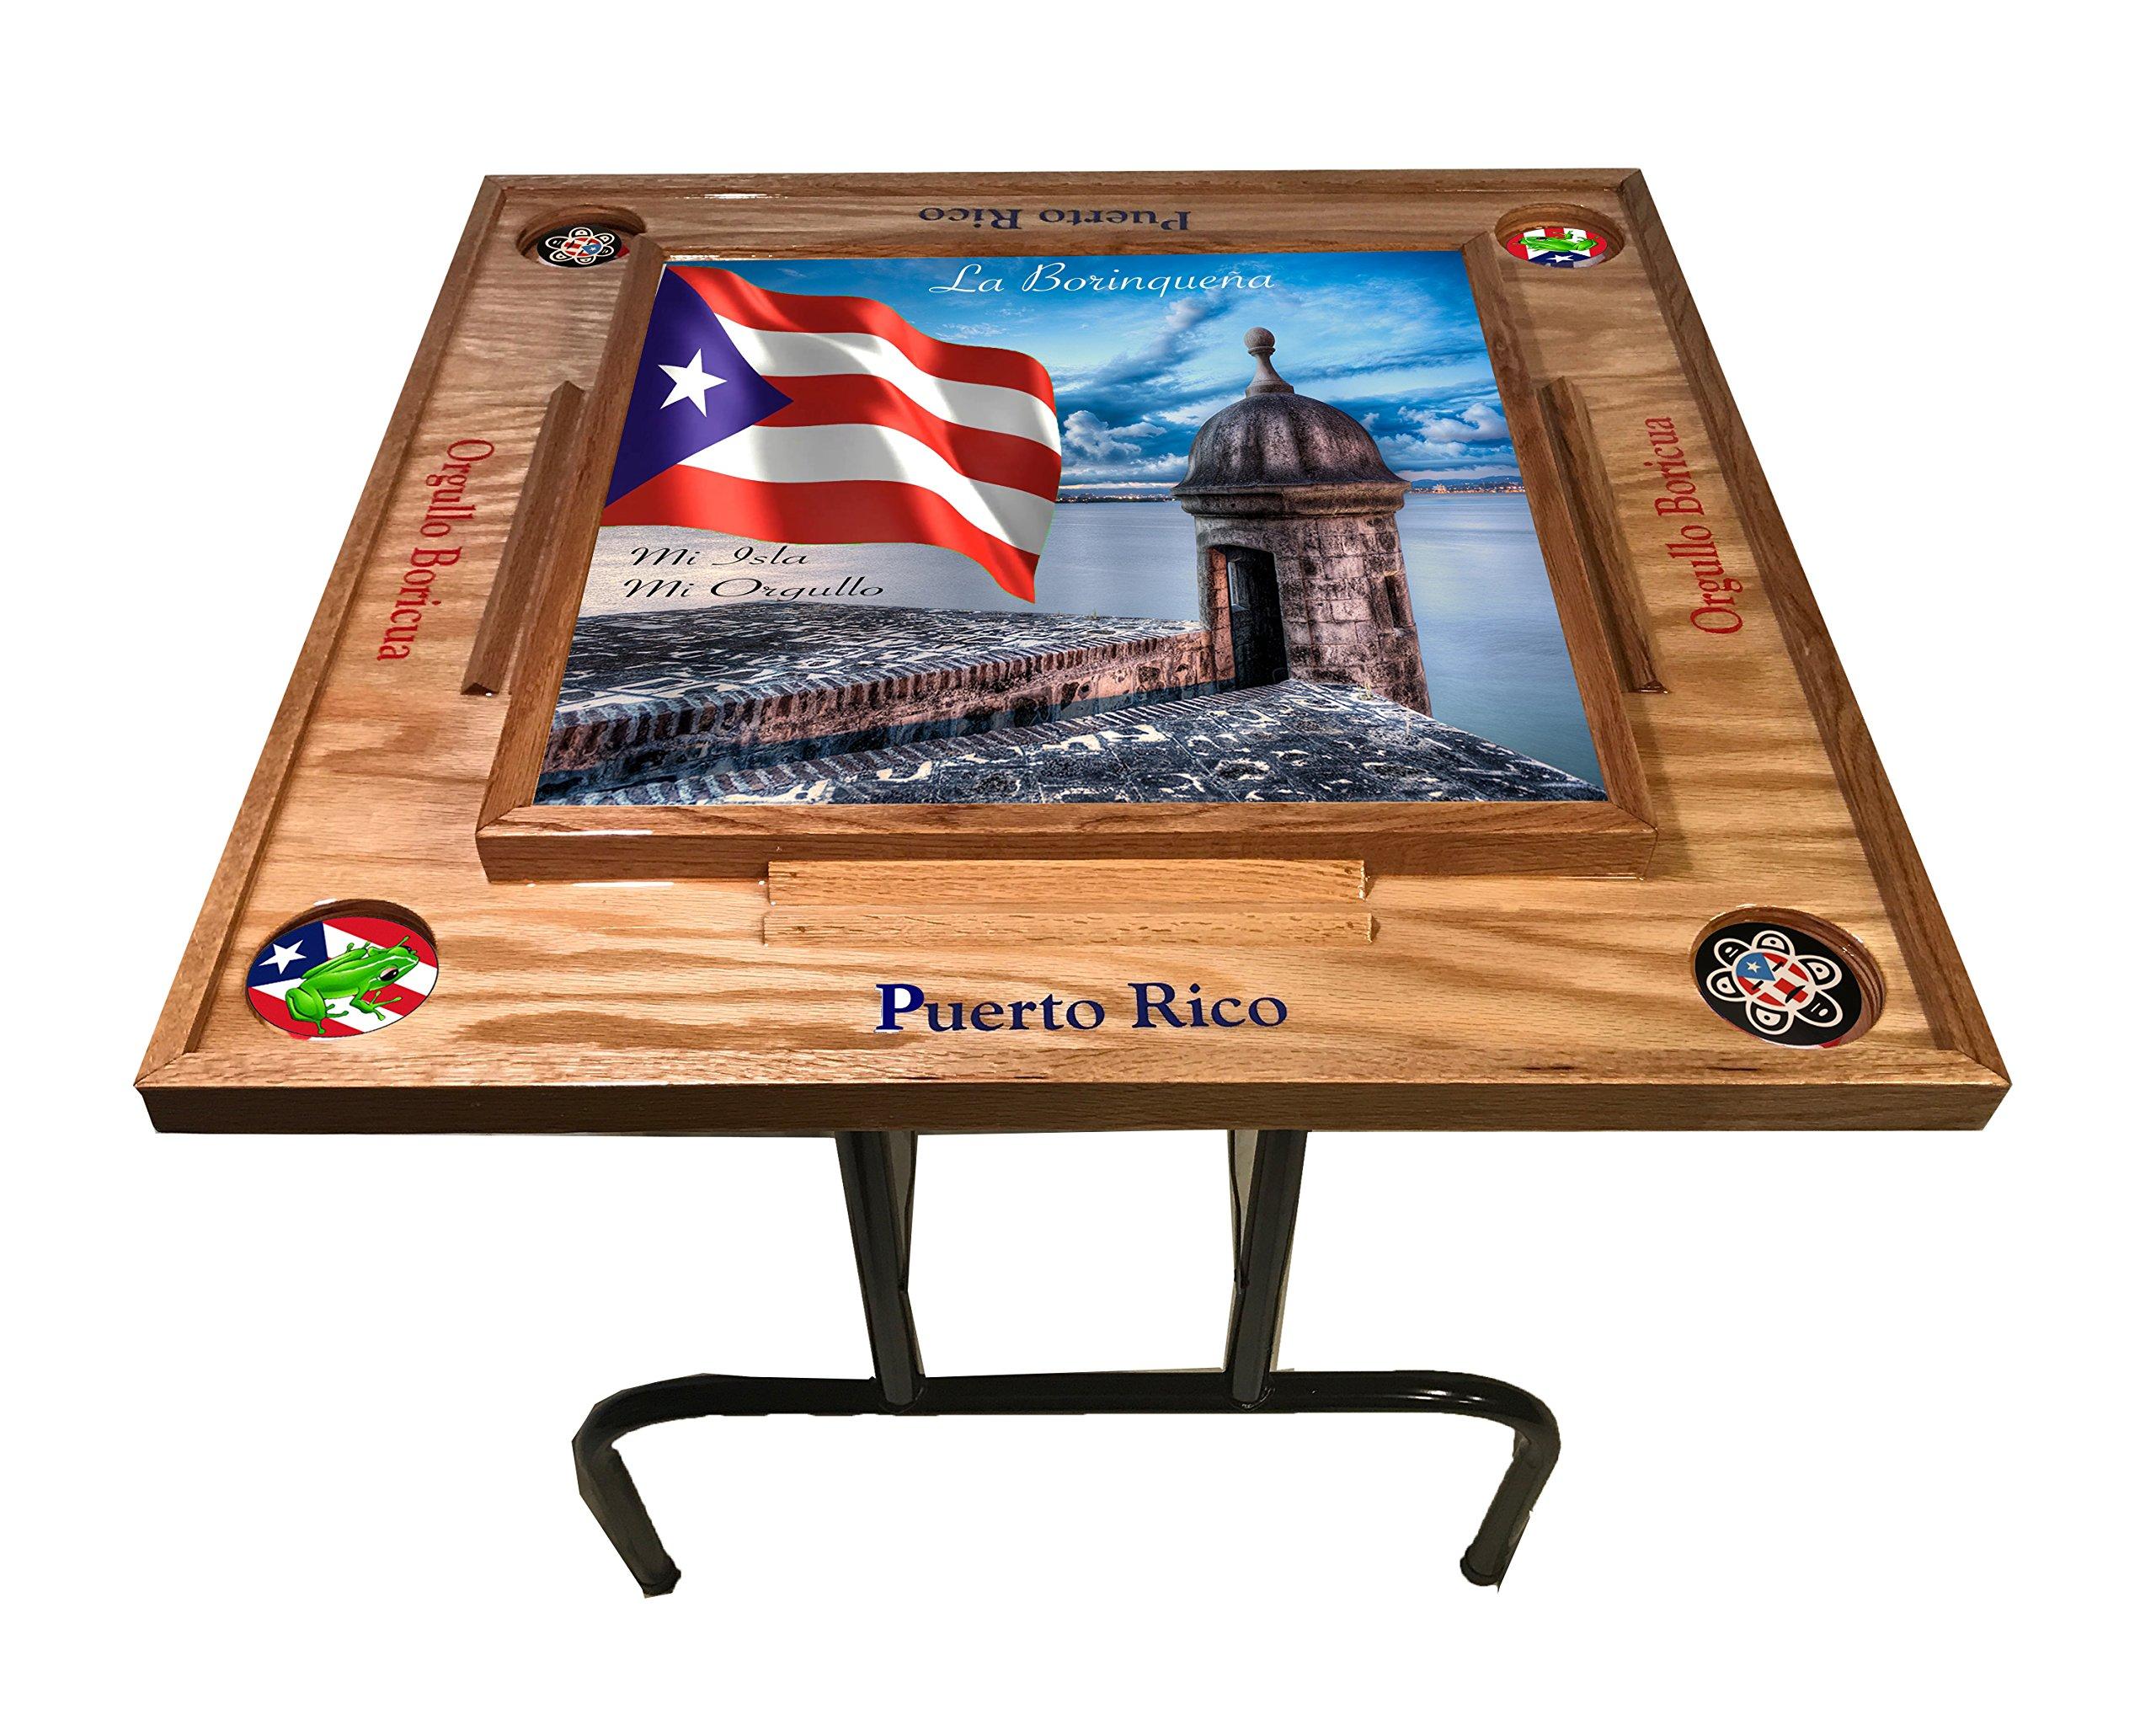 Puerto Rico Domino Table with the Morro (Natura)